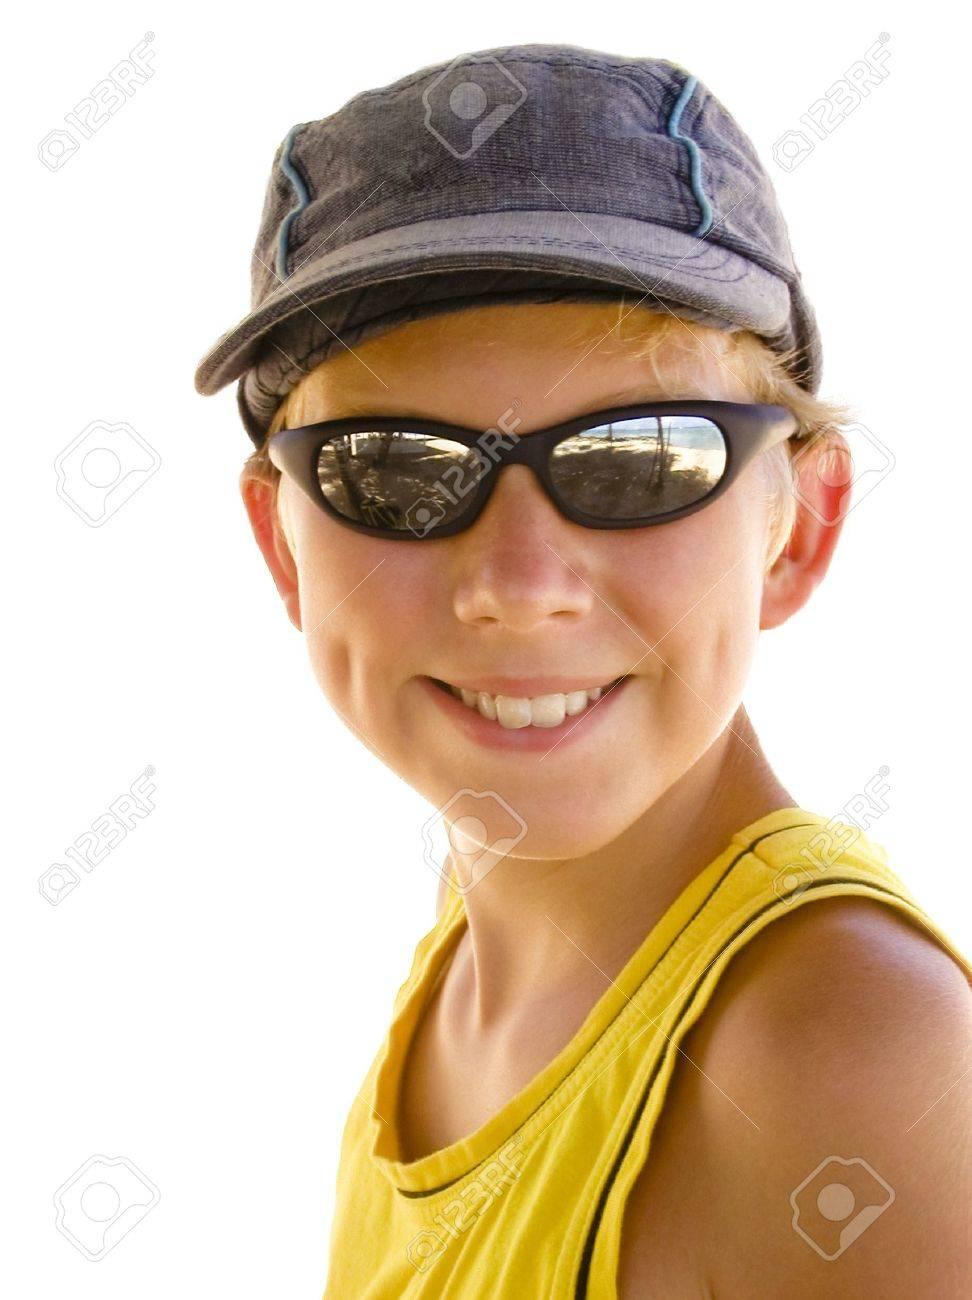 smart boy with sunglasses Stock Photo - 2875278